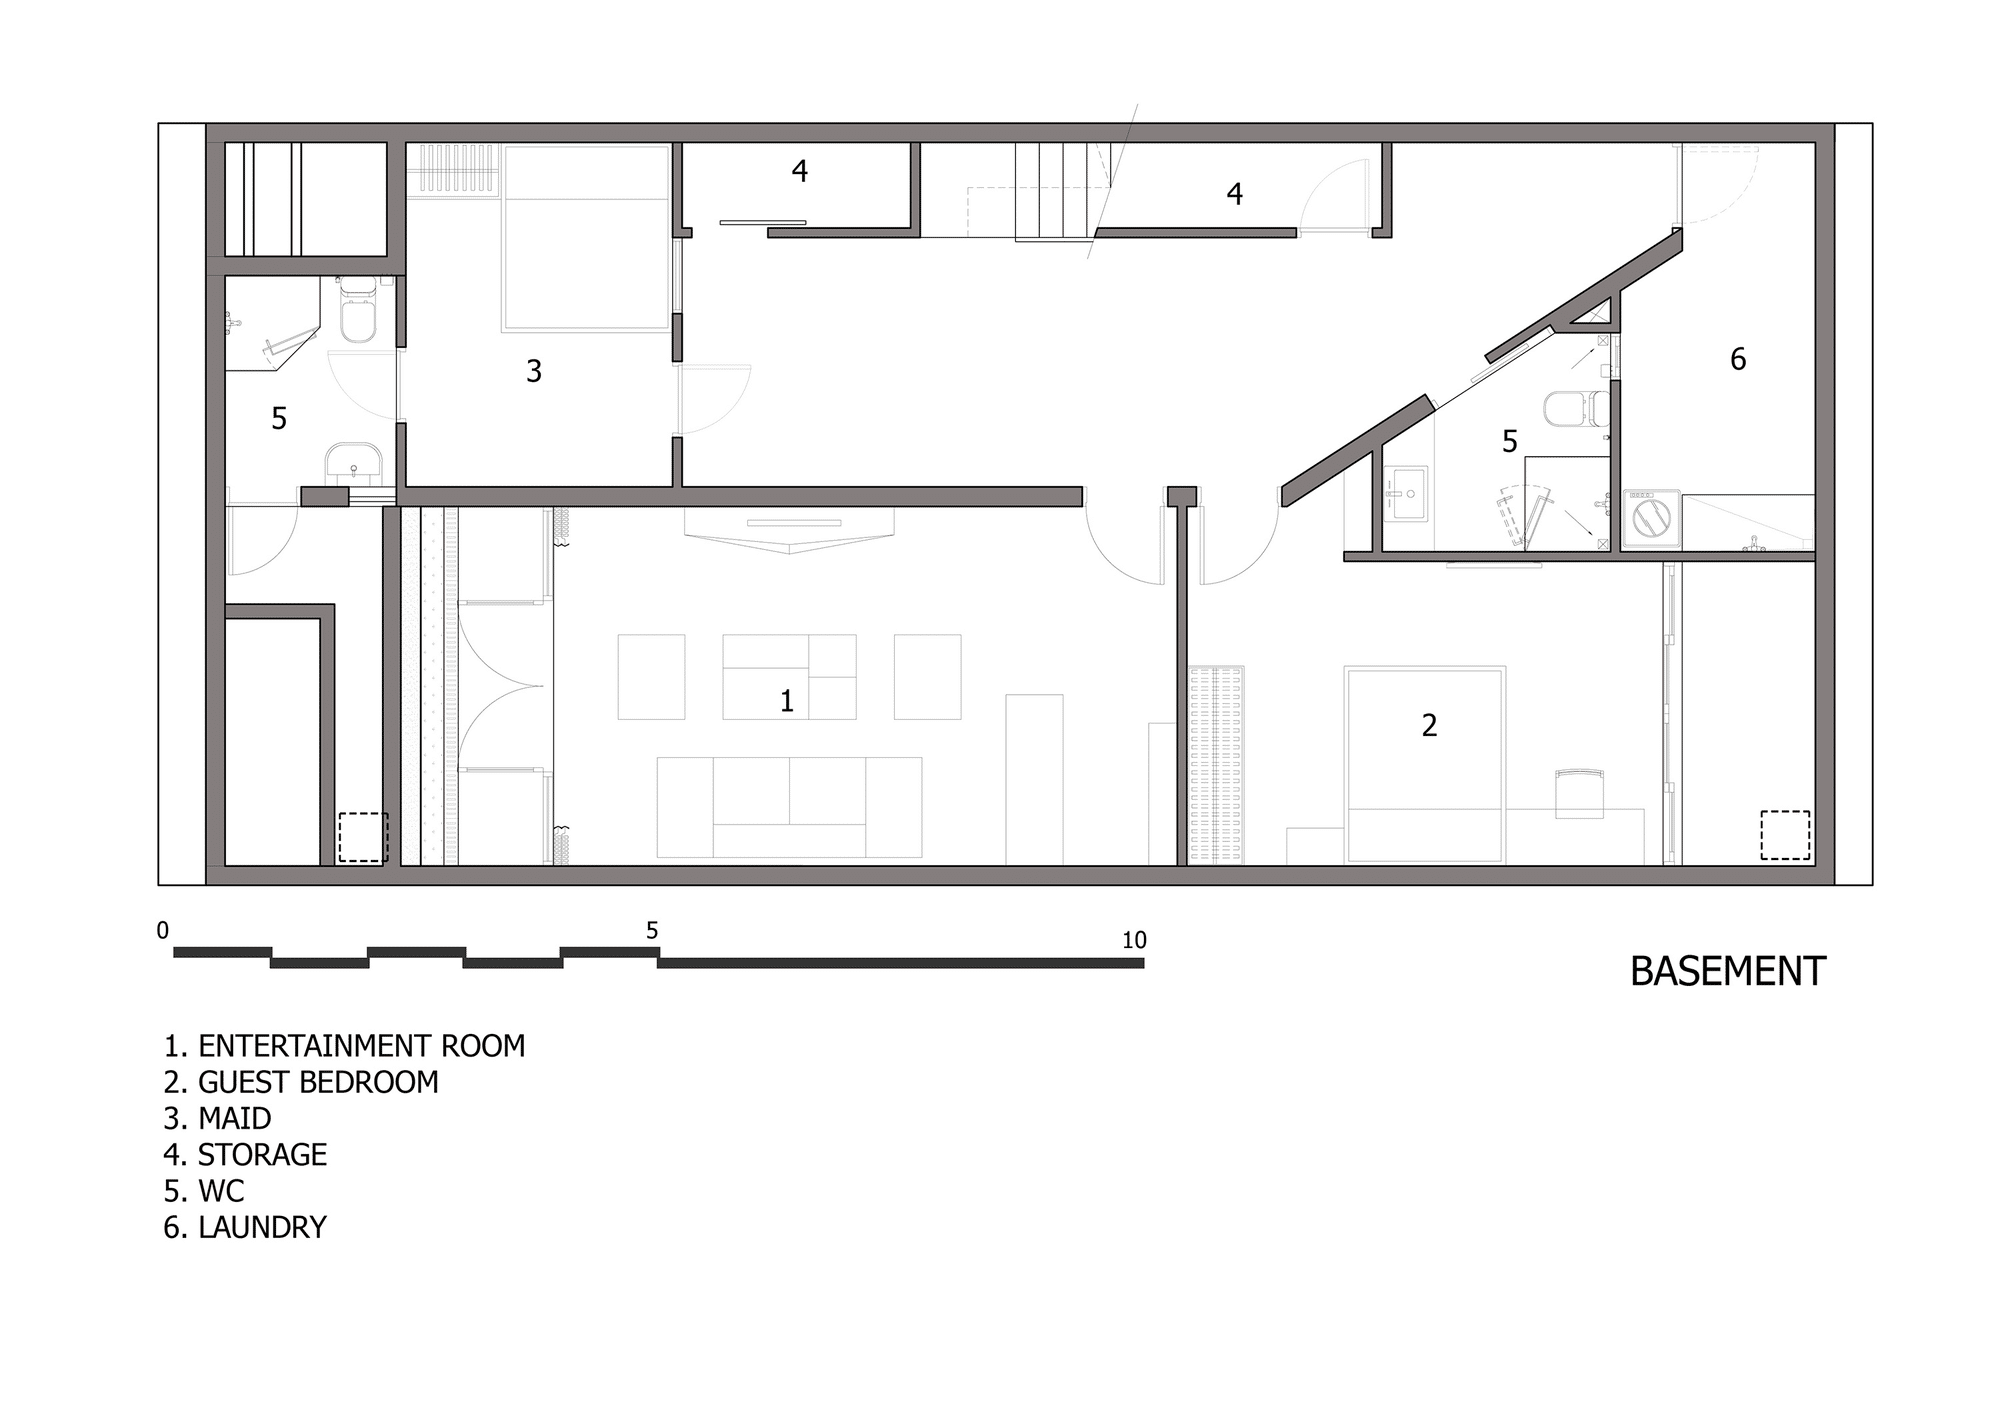 Dise o de casa moderna de tres pisos planos y fachada for Planos de casas medianas